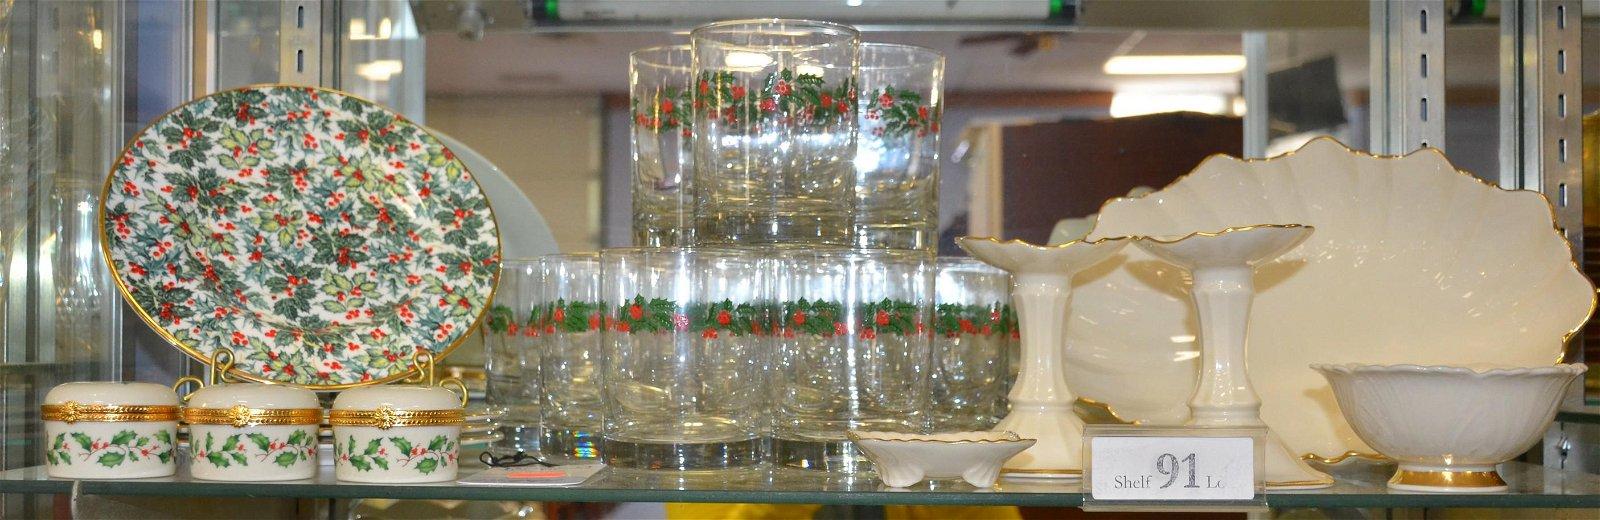 Shelf #91- Holiday Glass and Lenox